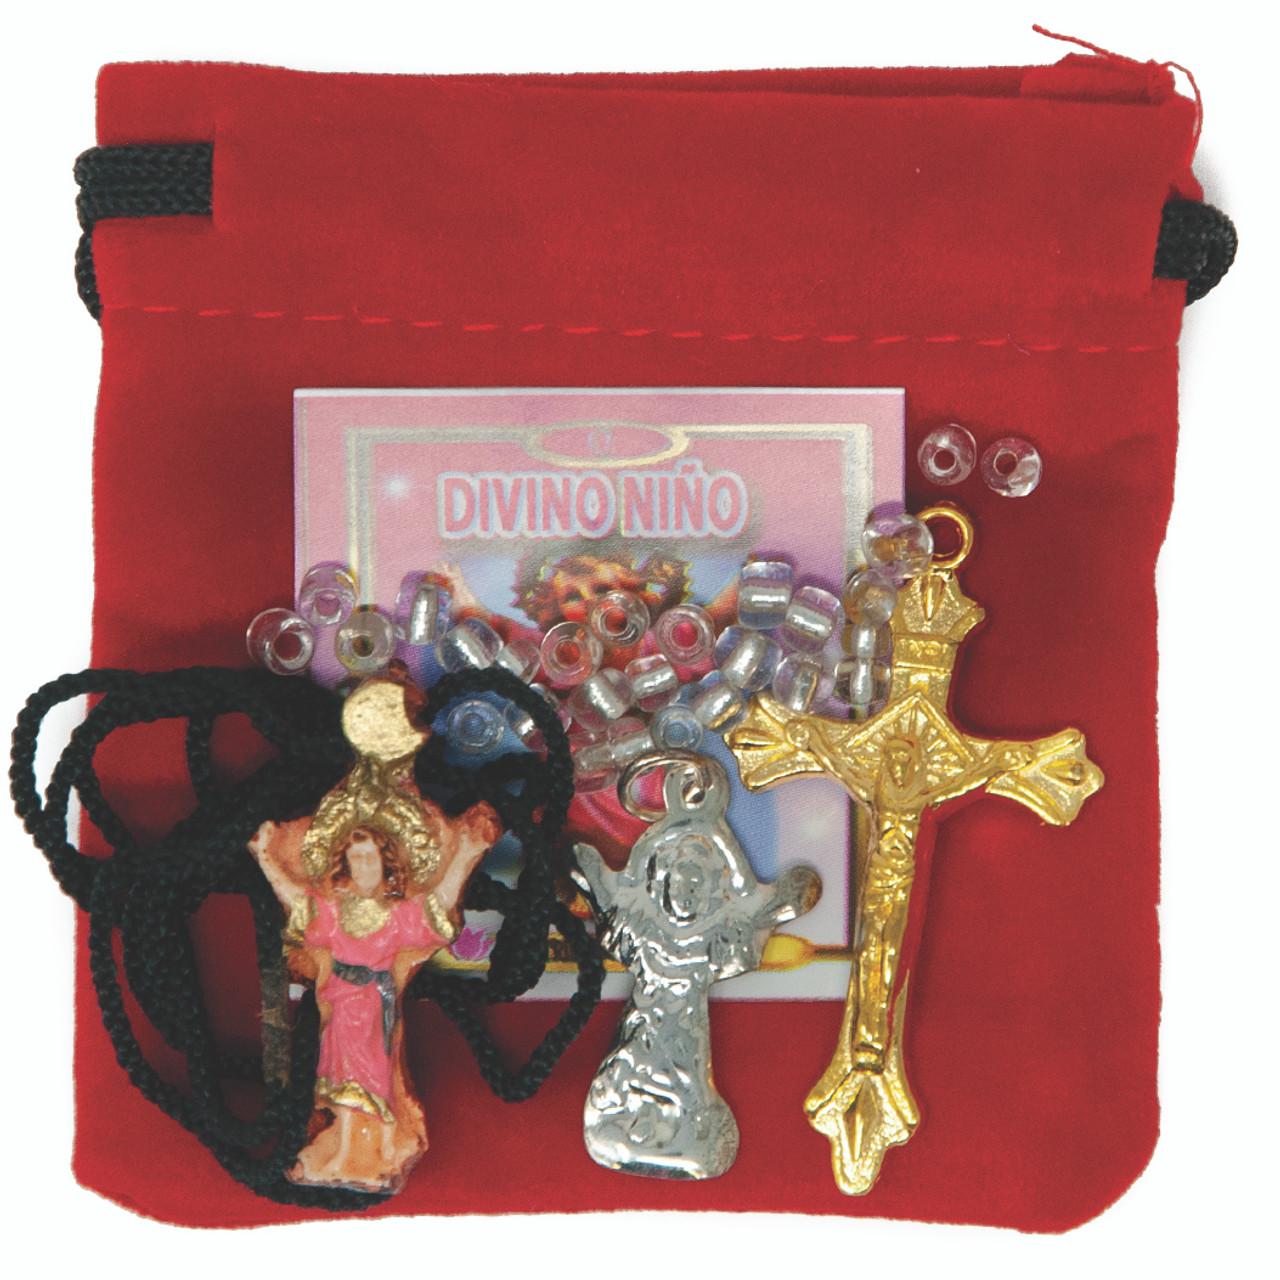 Resguardo Divino Niño (Divine Child)